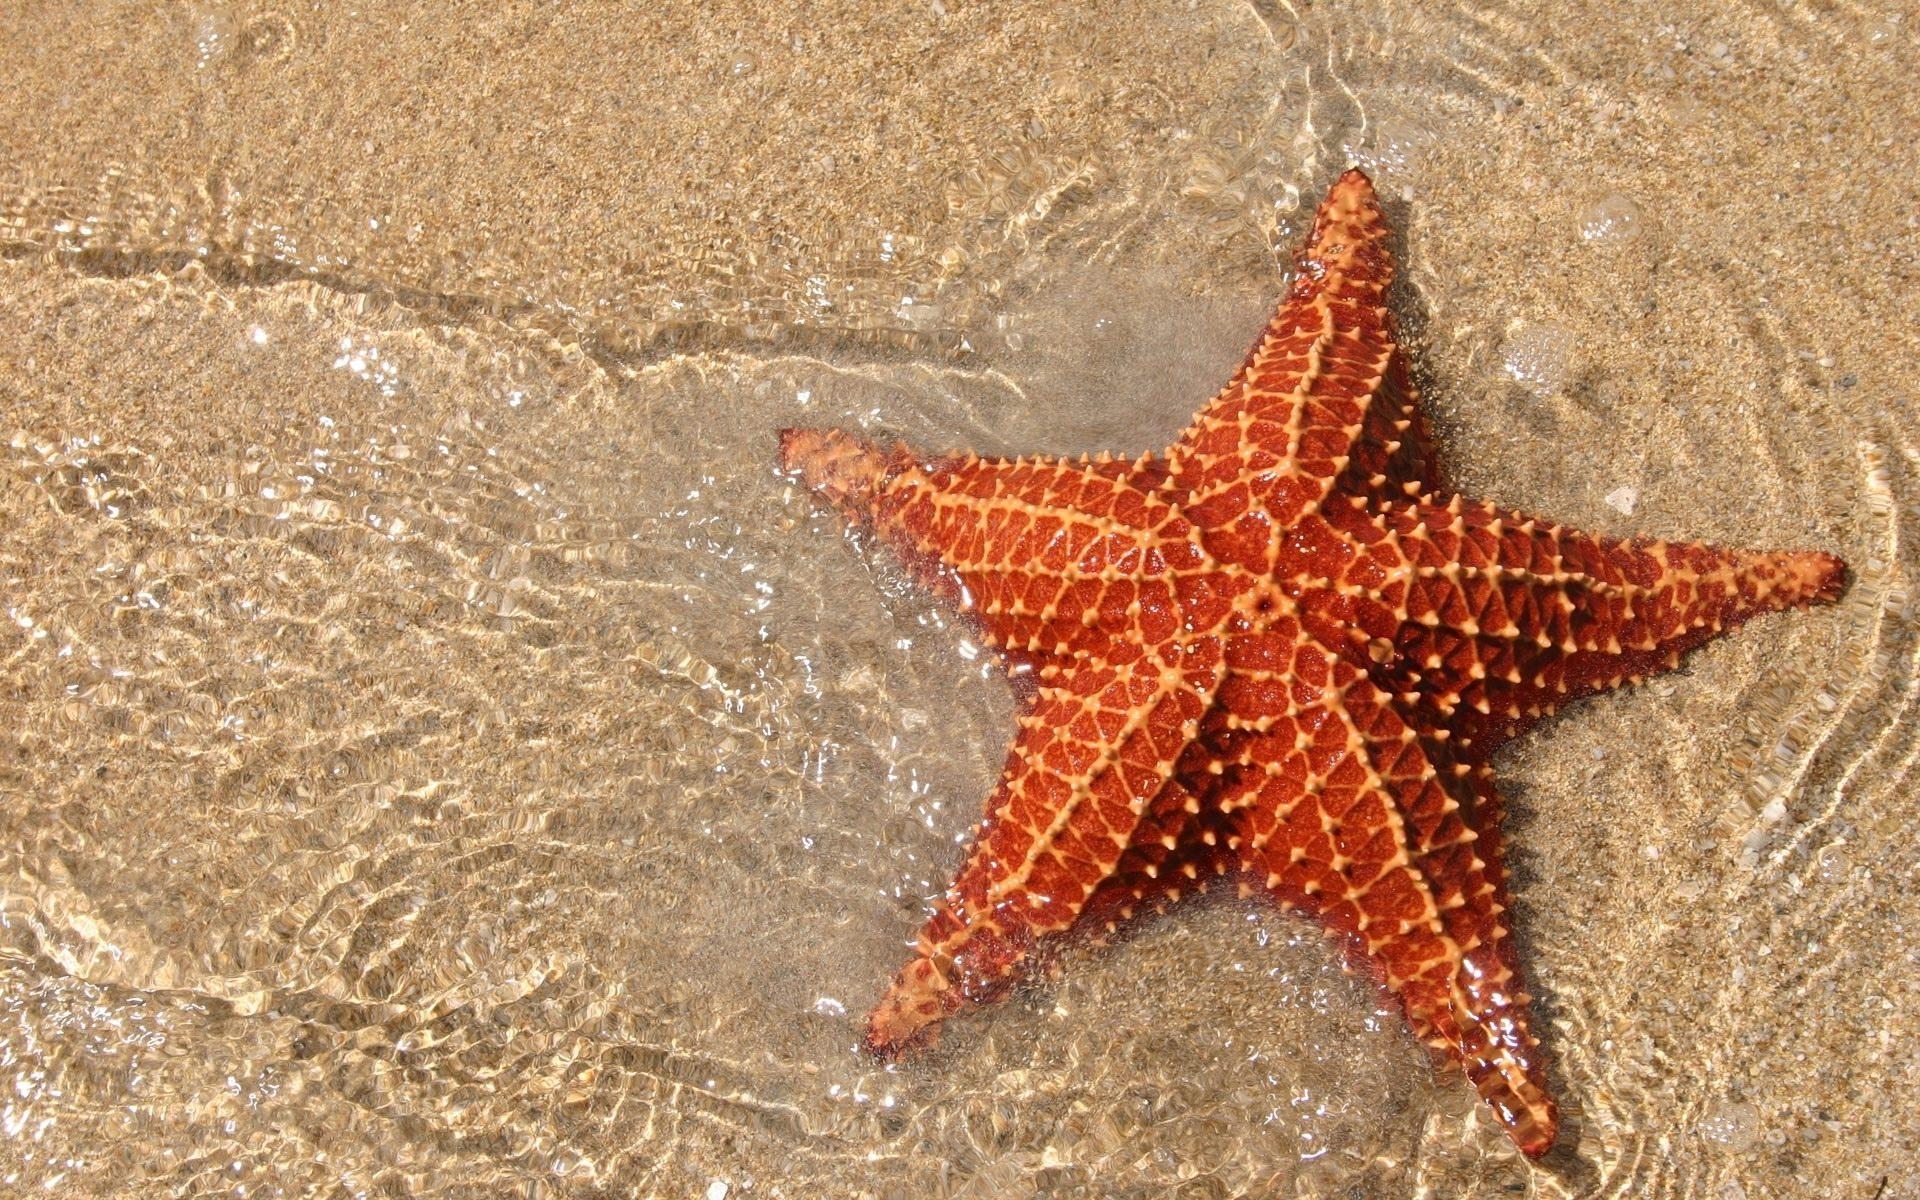 image ocean sand sea star jpg marine wiki fandom powered by wikia